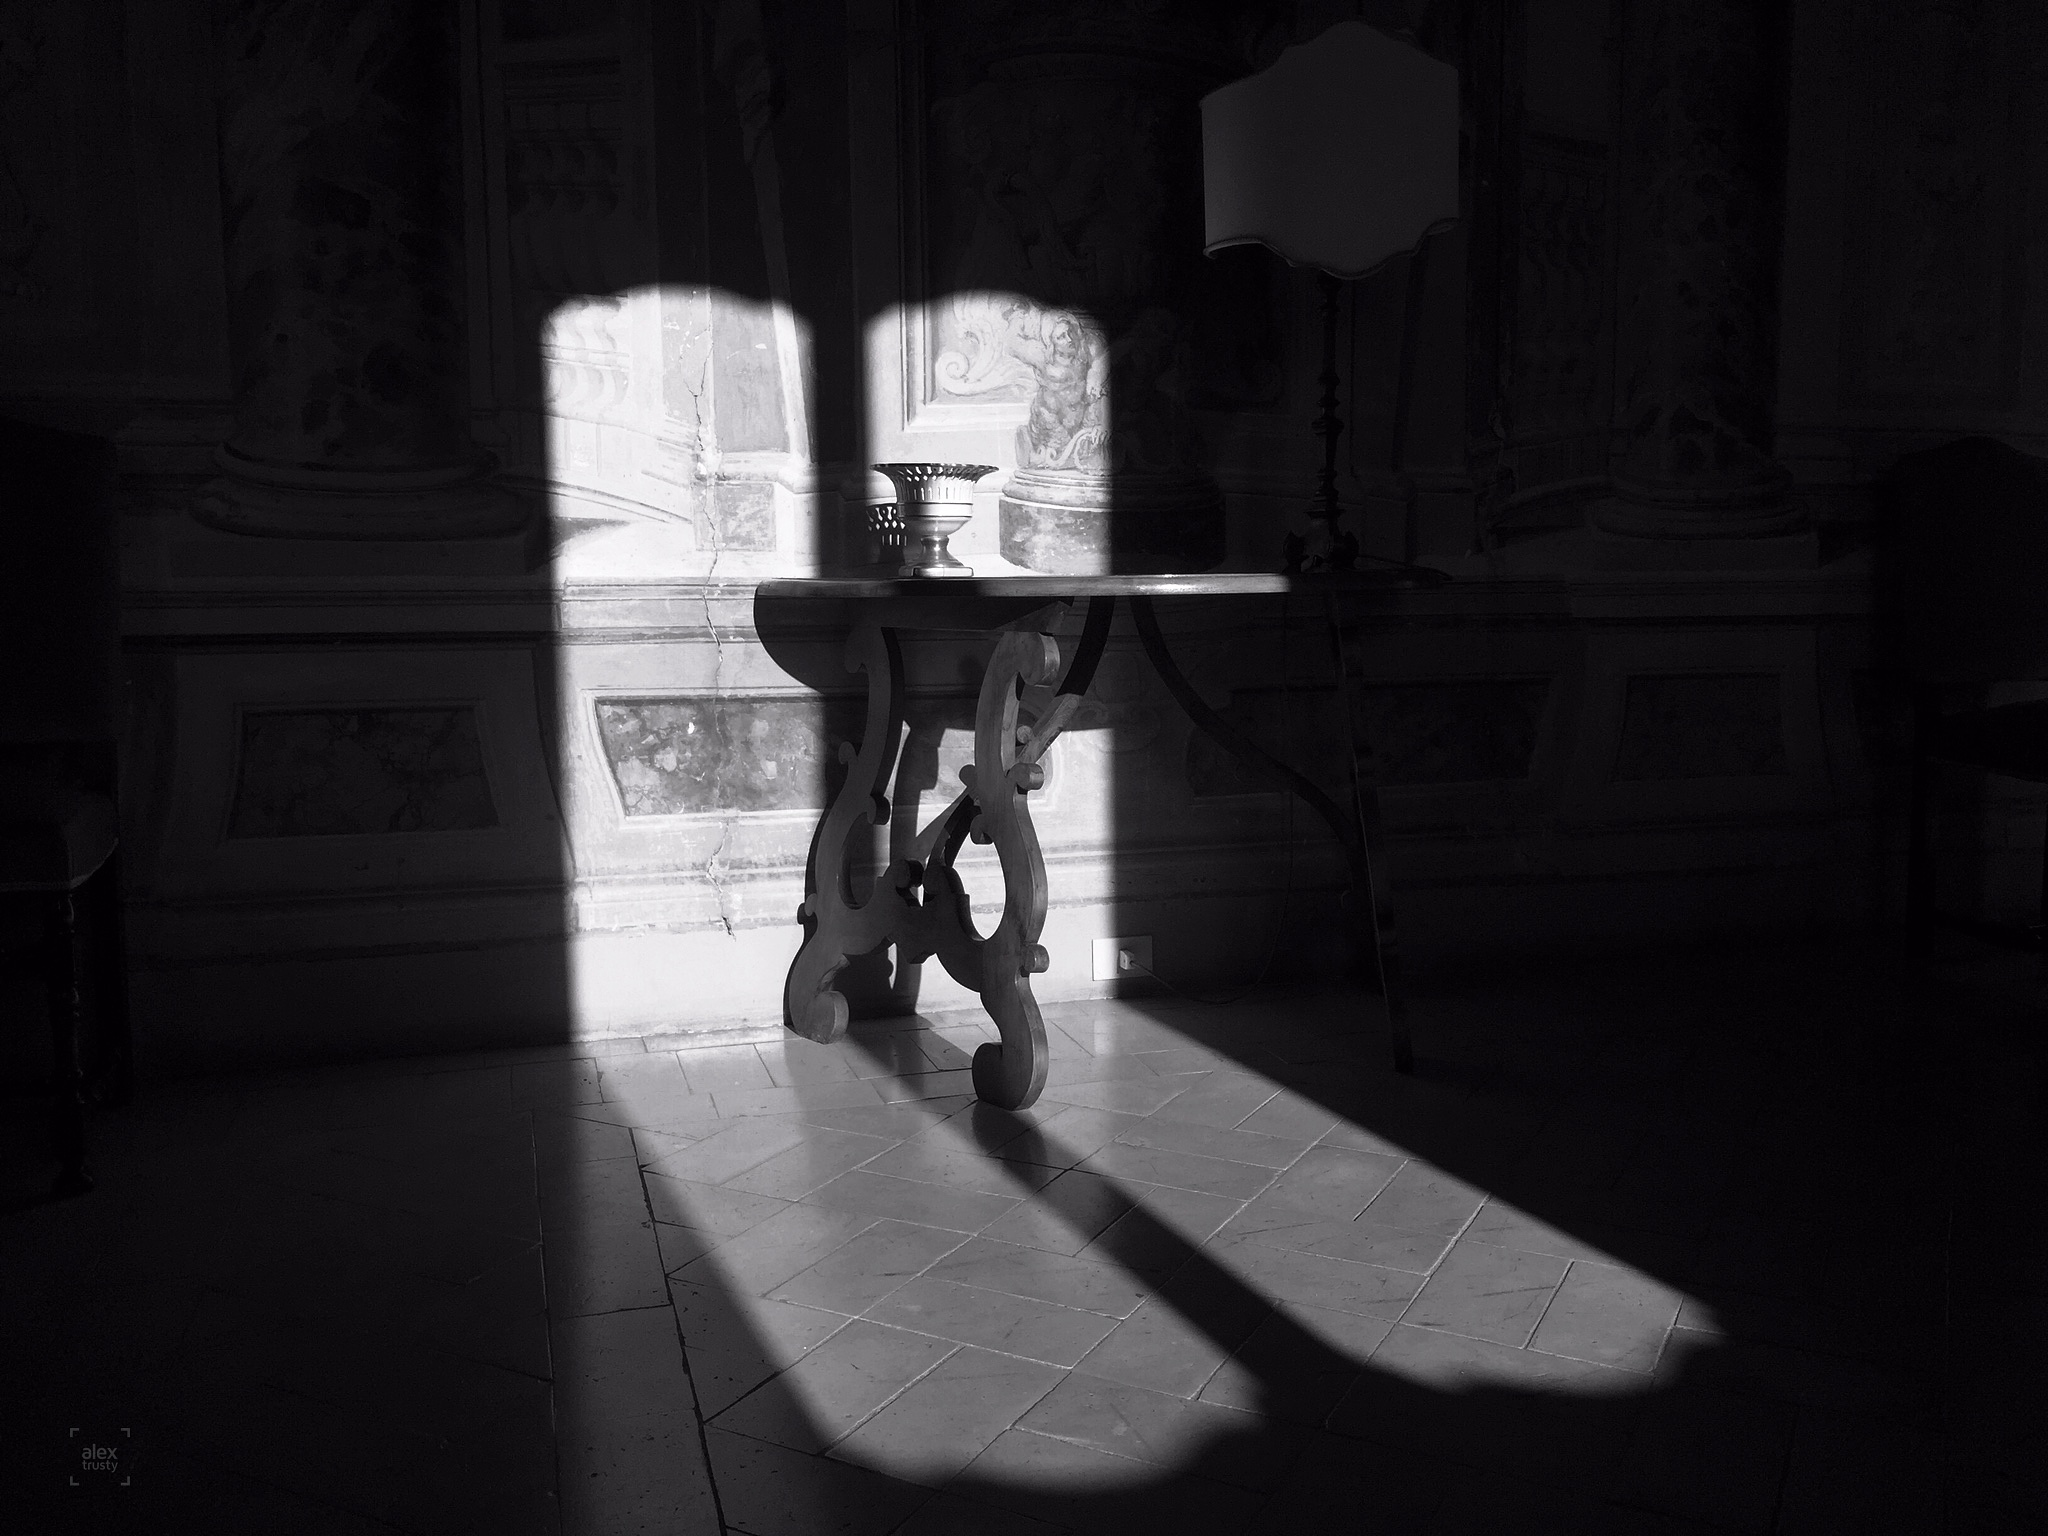 villa grazioli light and shadows  by alextrusty